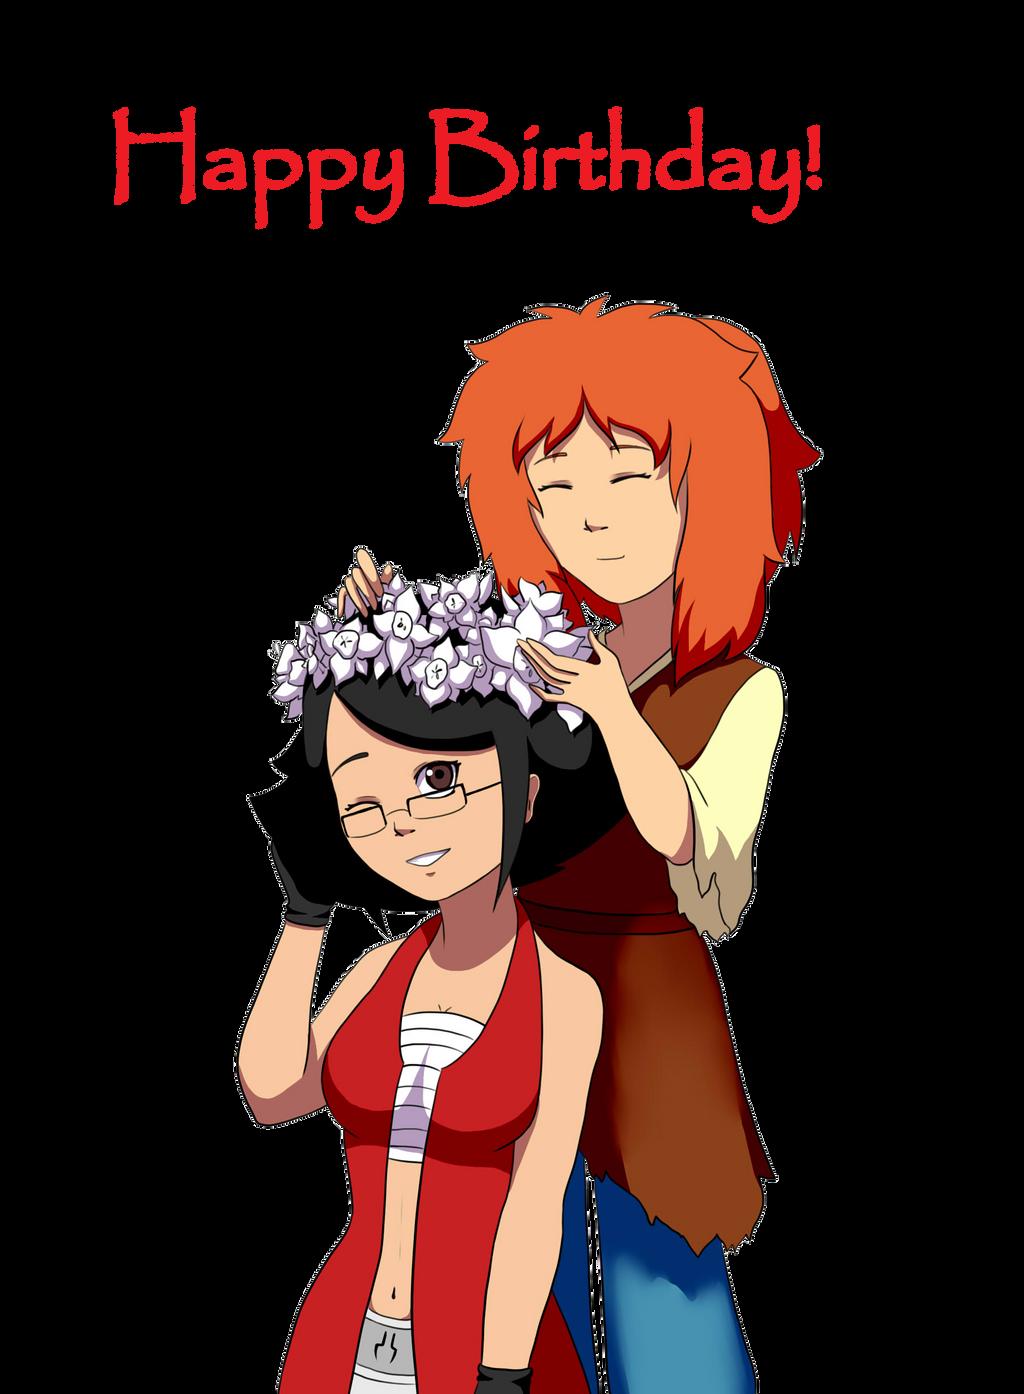 Happy birthday by Jenny-626